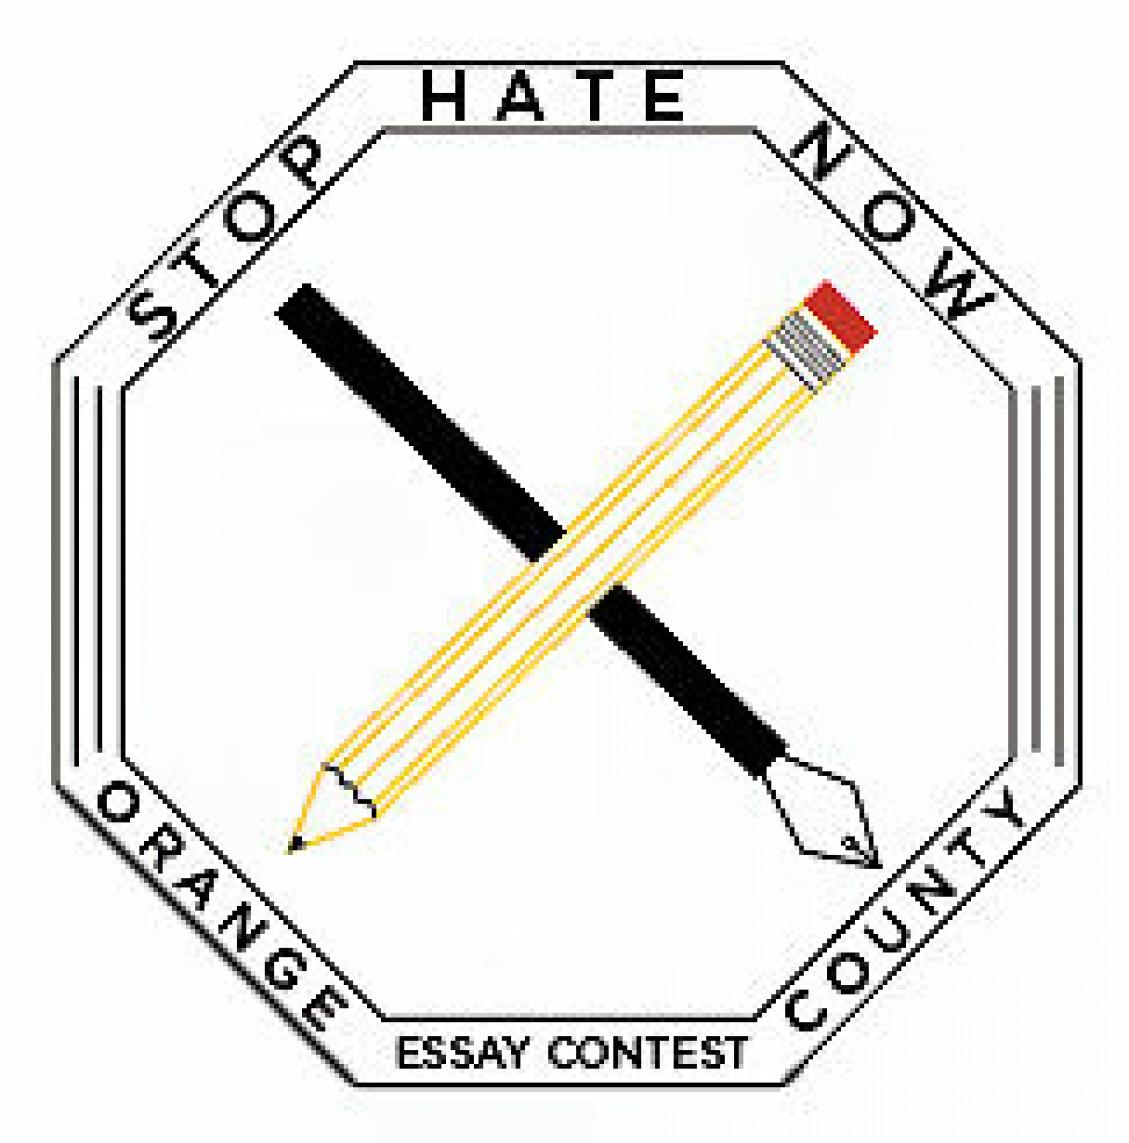 Signet classics scholarship essay contest 2012